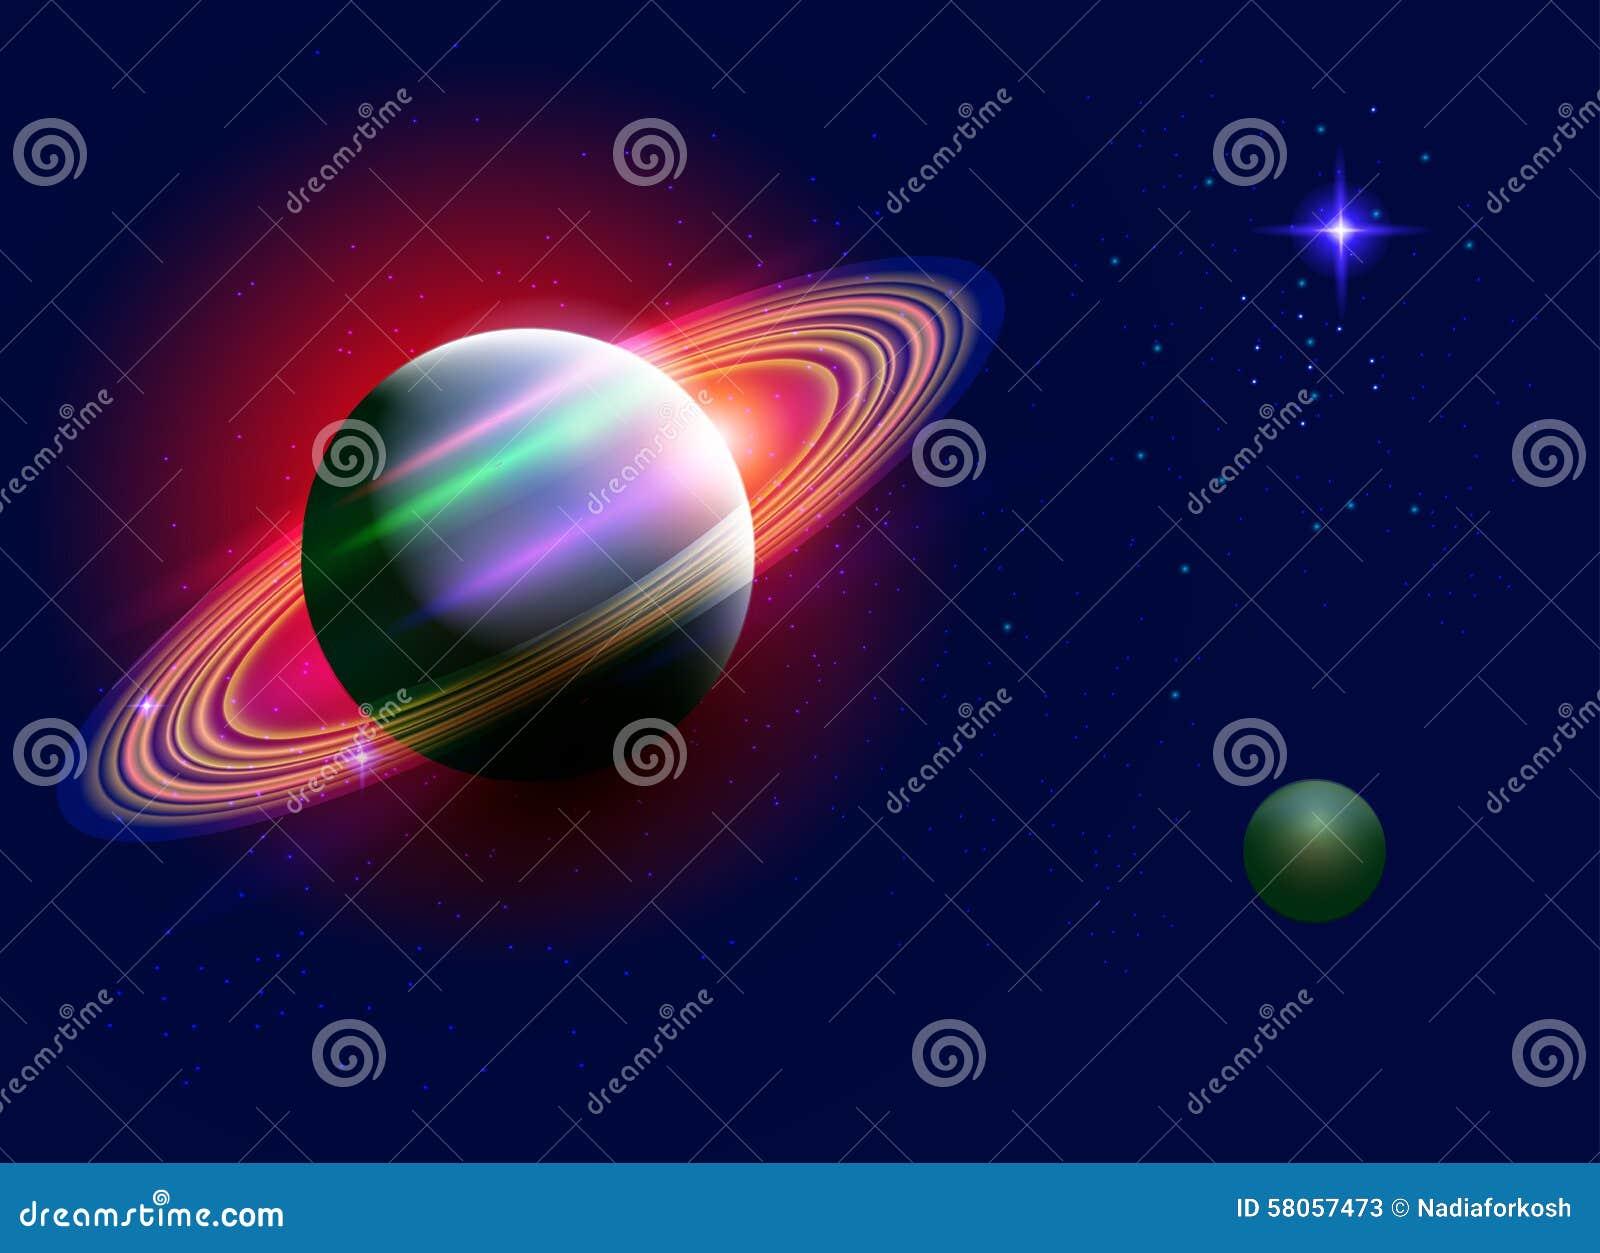 galaxy saturn planet stars - photo #40